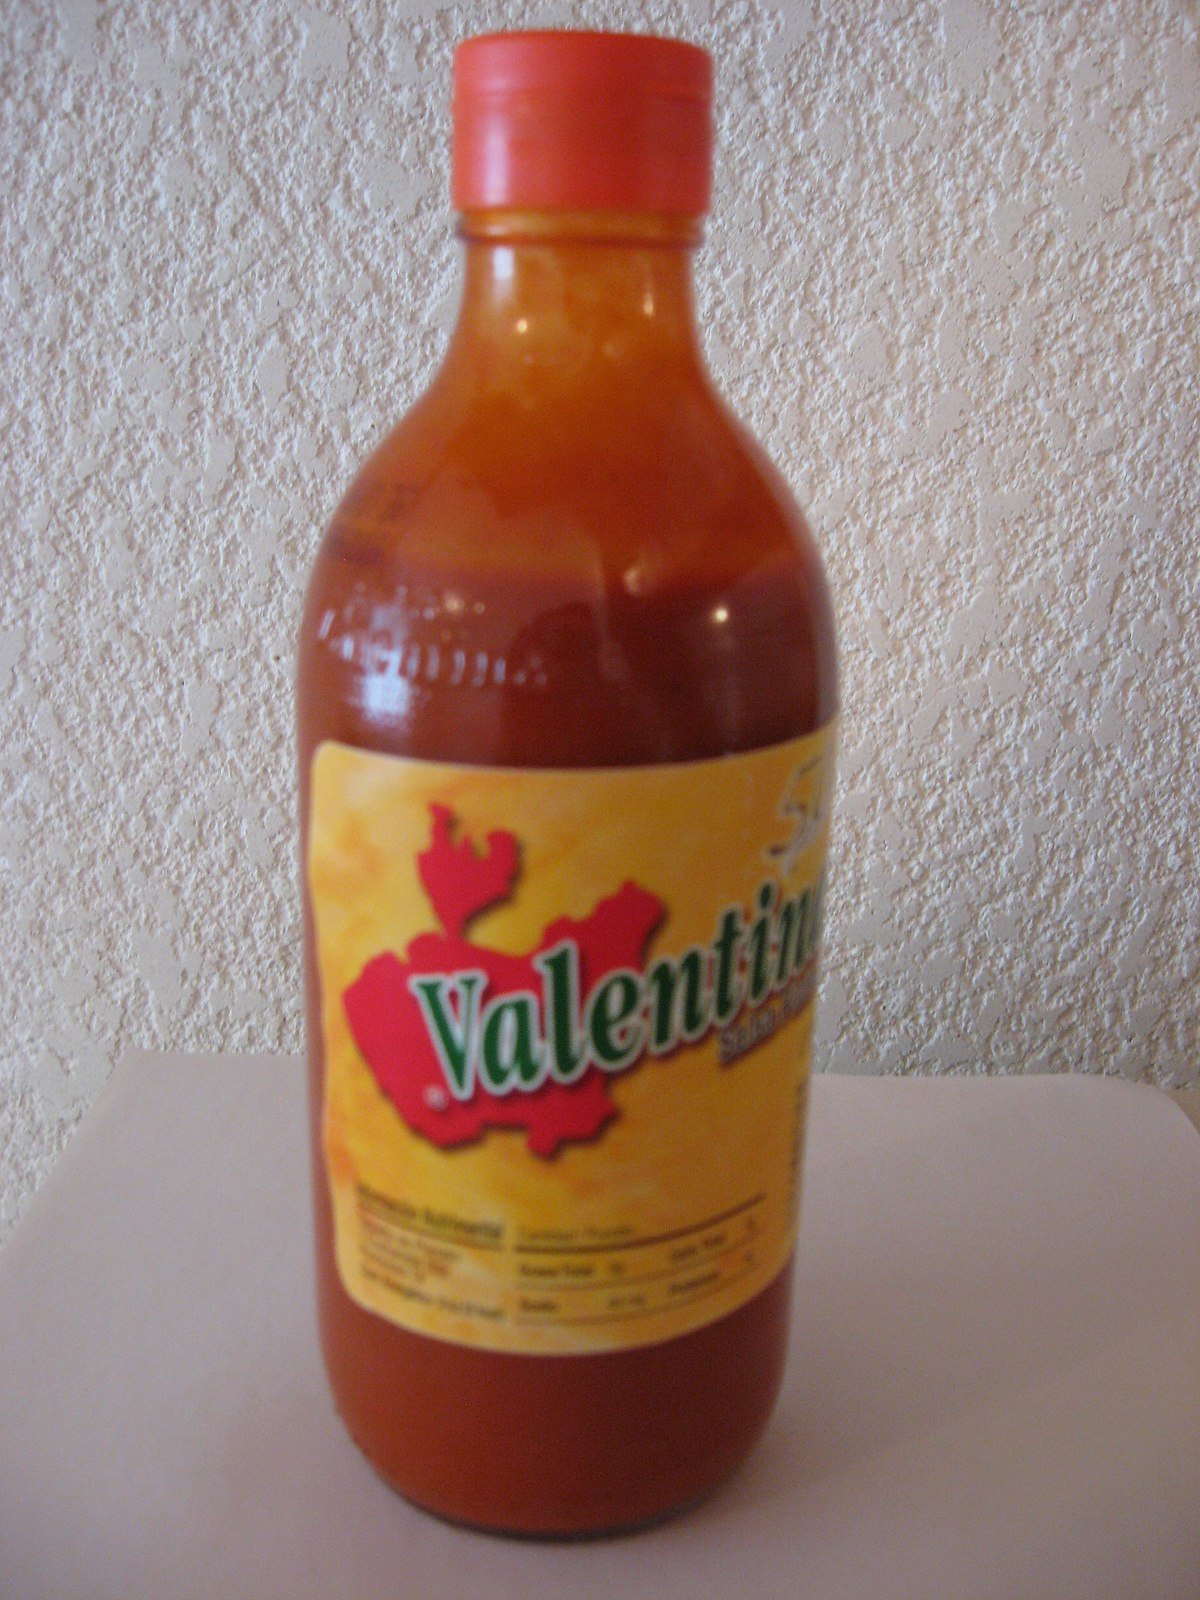 Valentina Hot Sauce Wikipedia